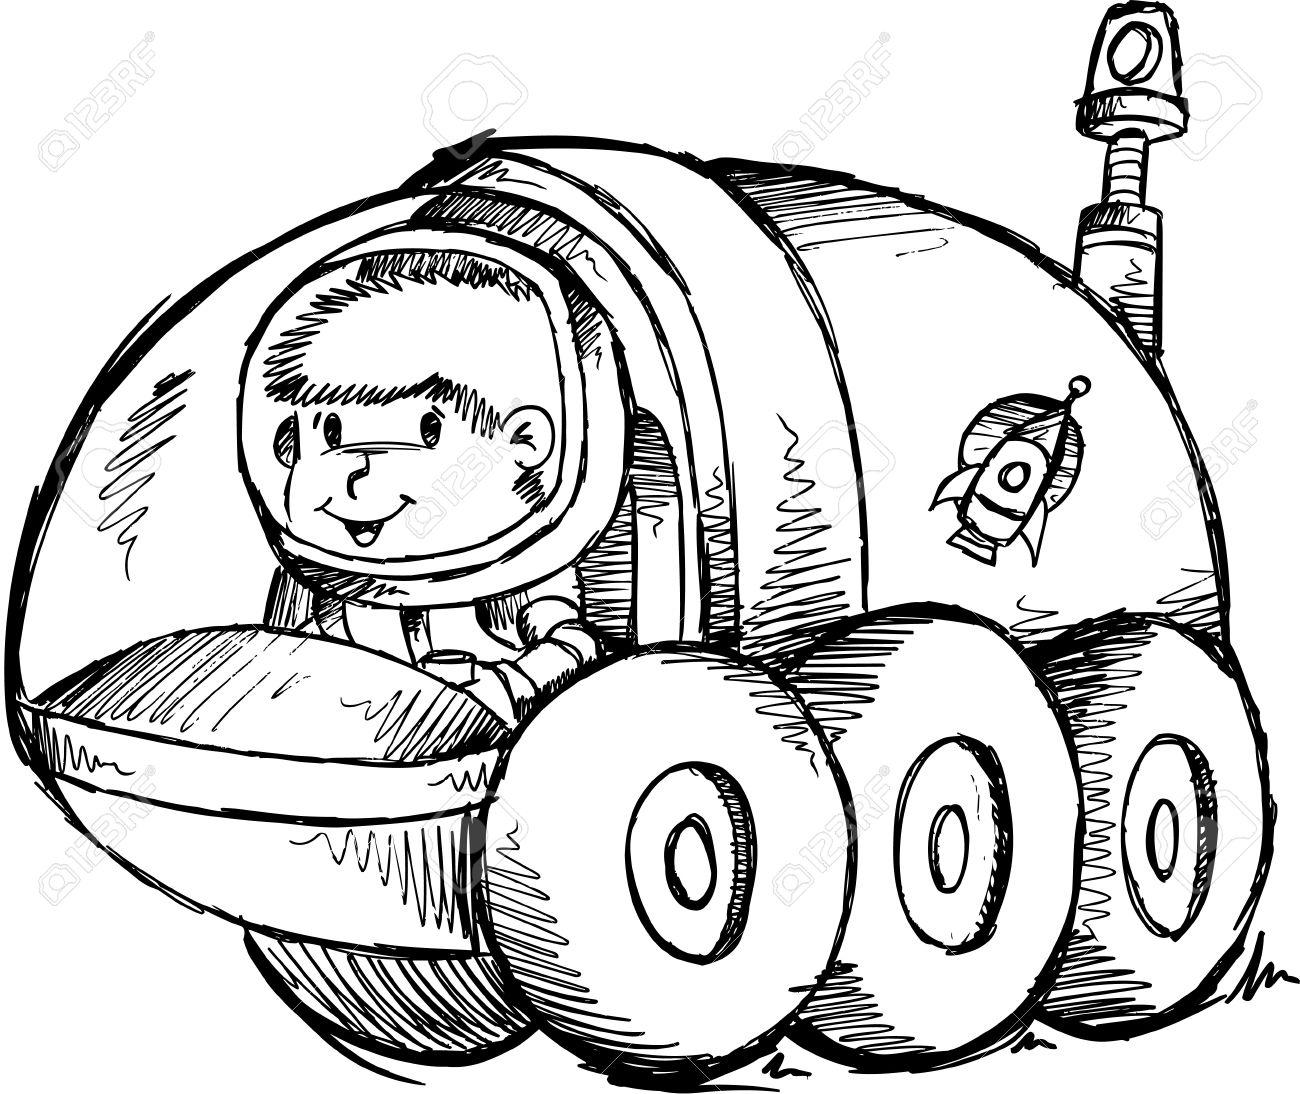 Moon buggy clipart.